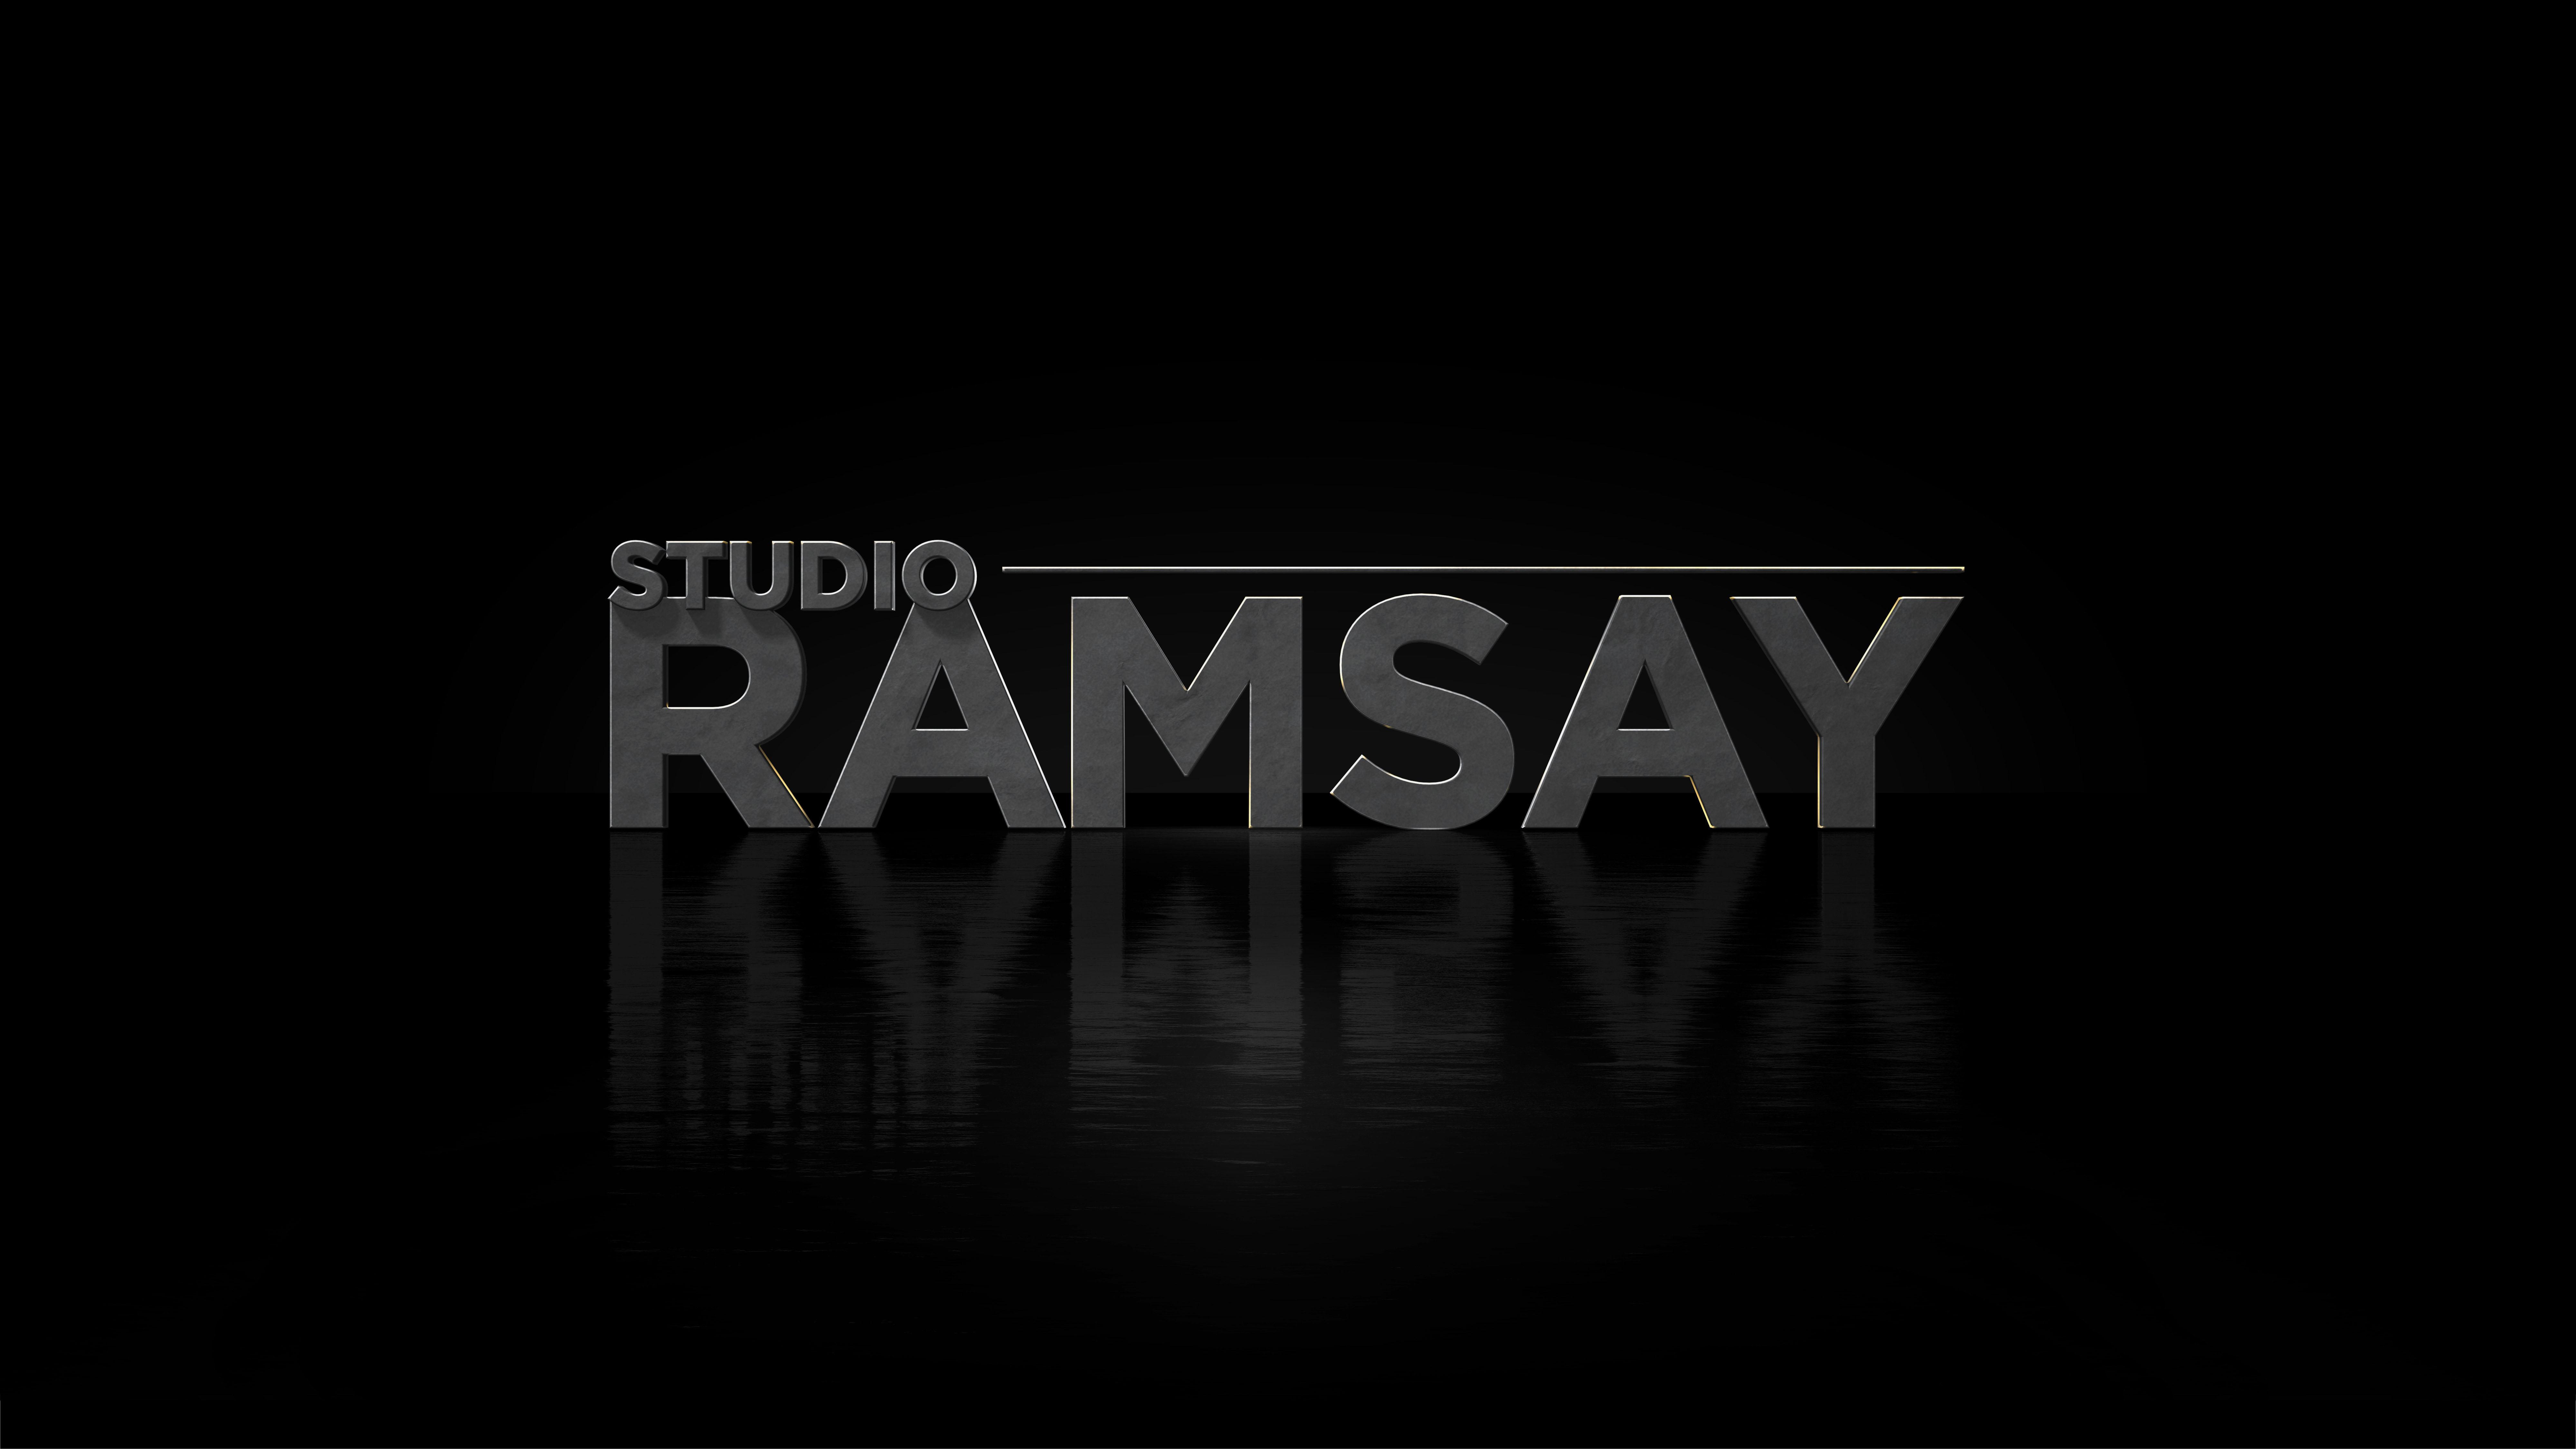 studio-ramsay_logo-jpg